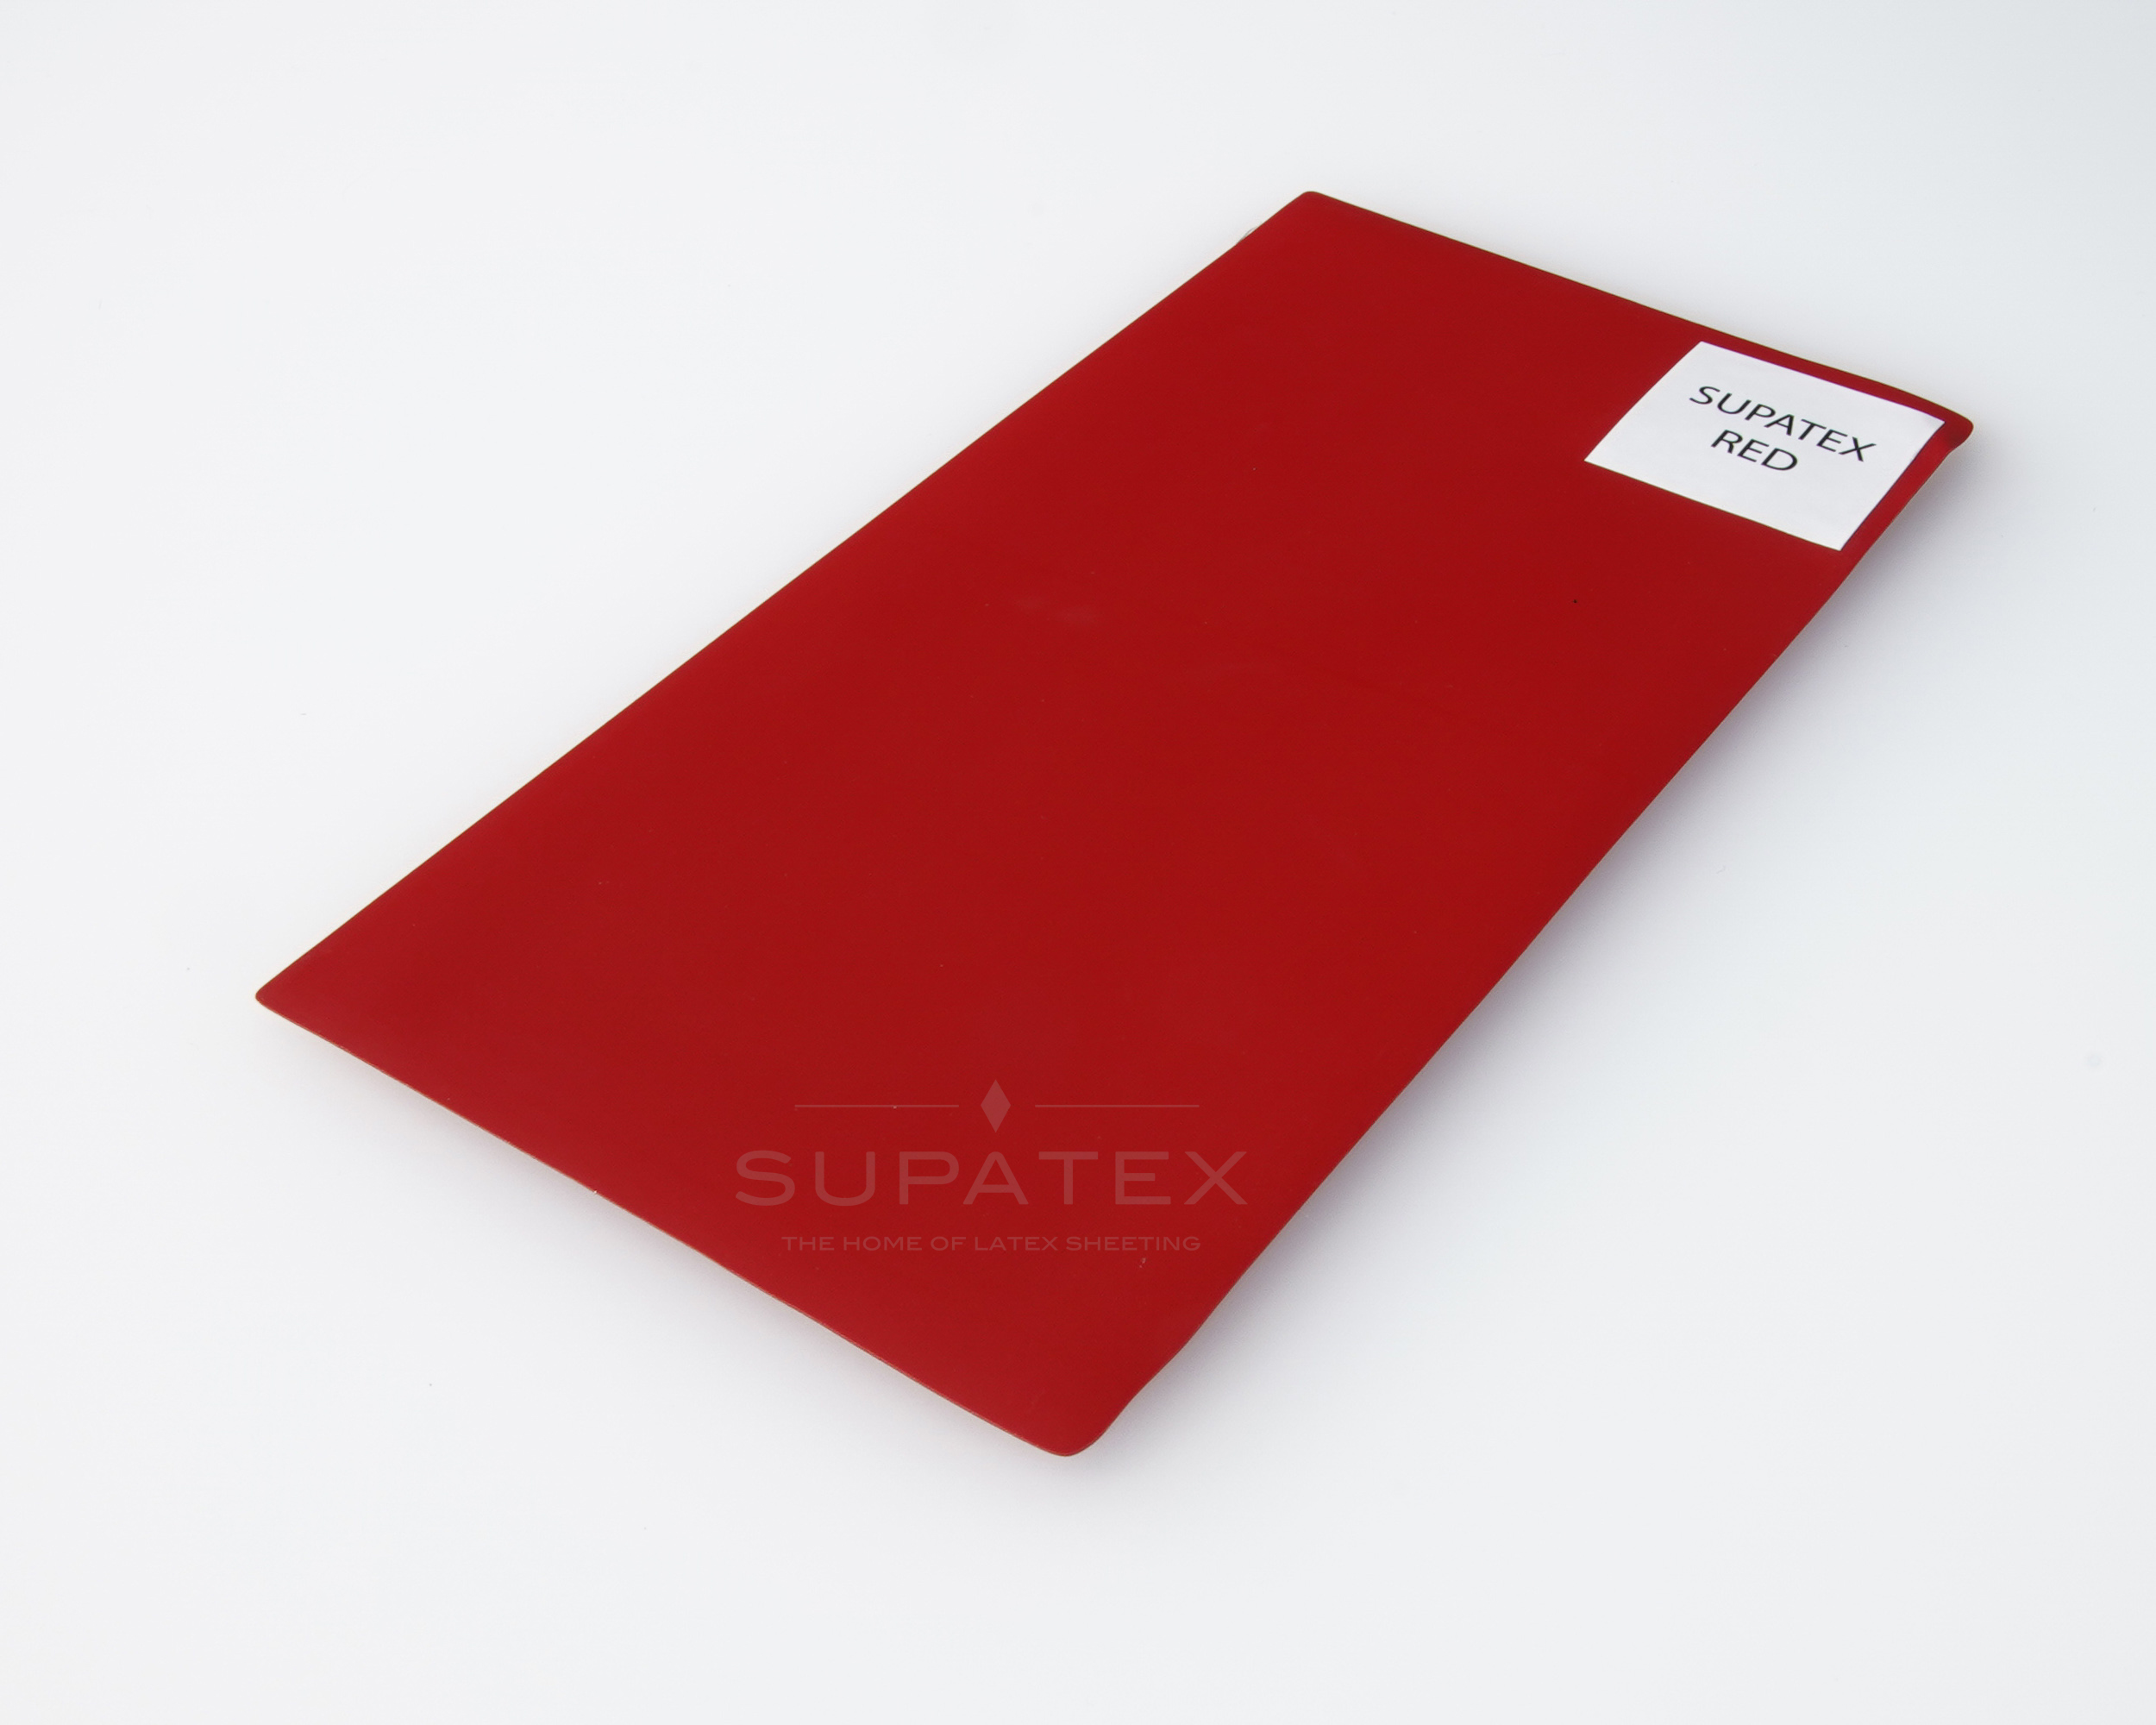 Supatex Red 0.33 mm